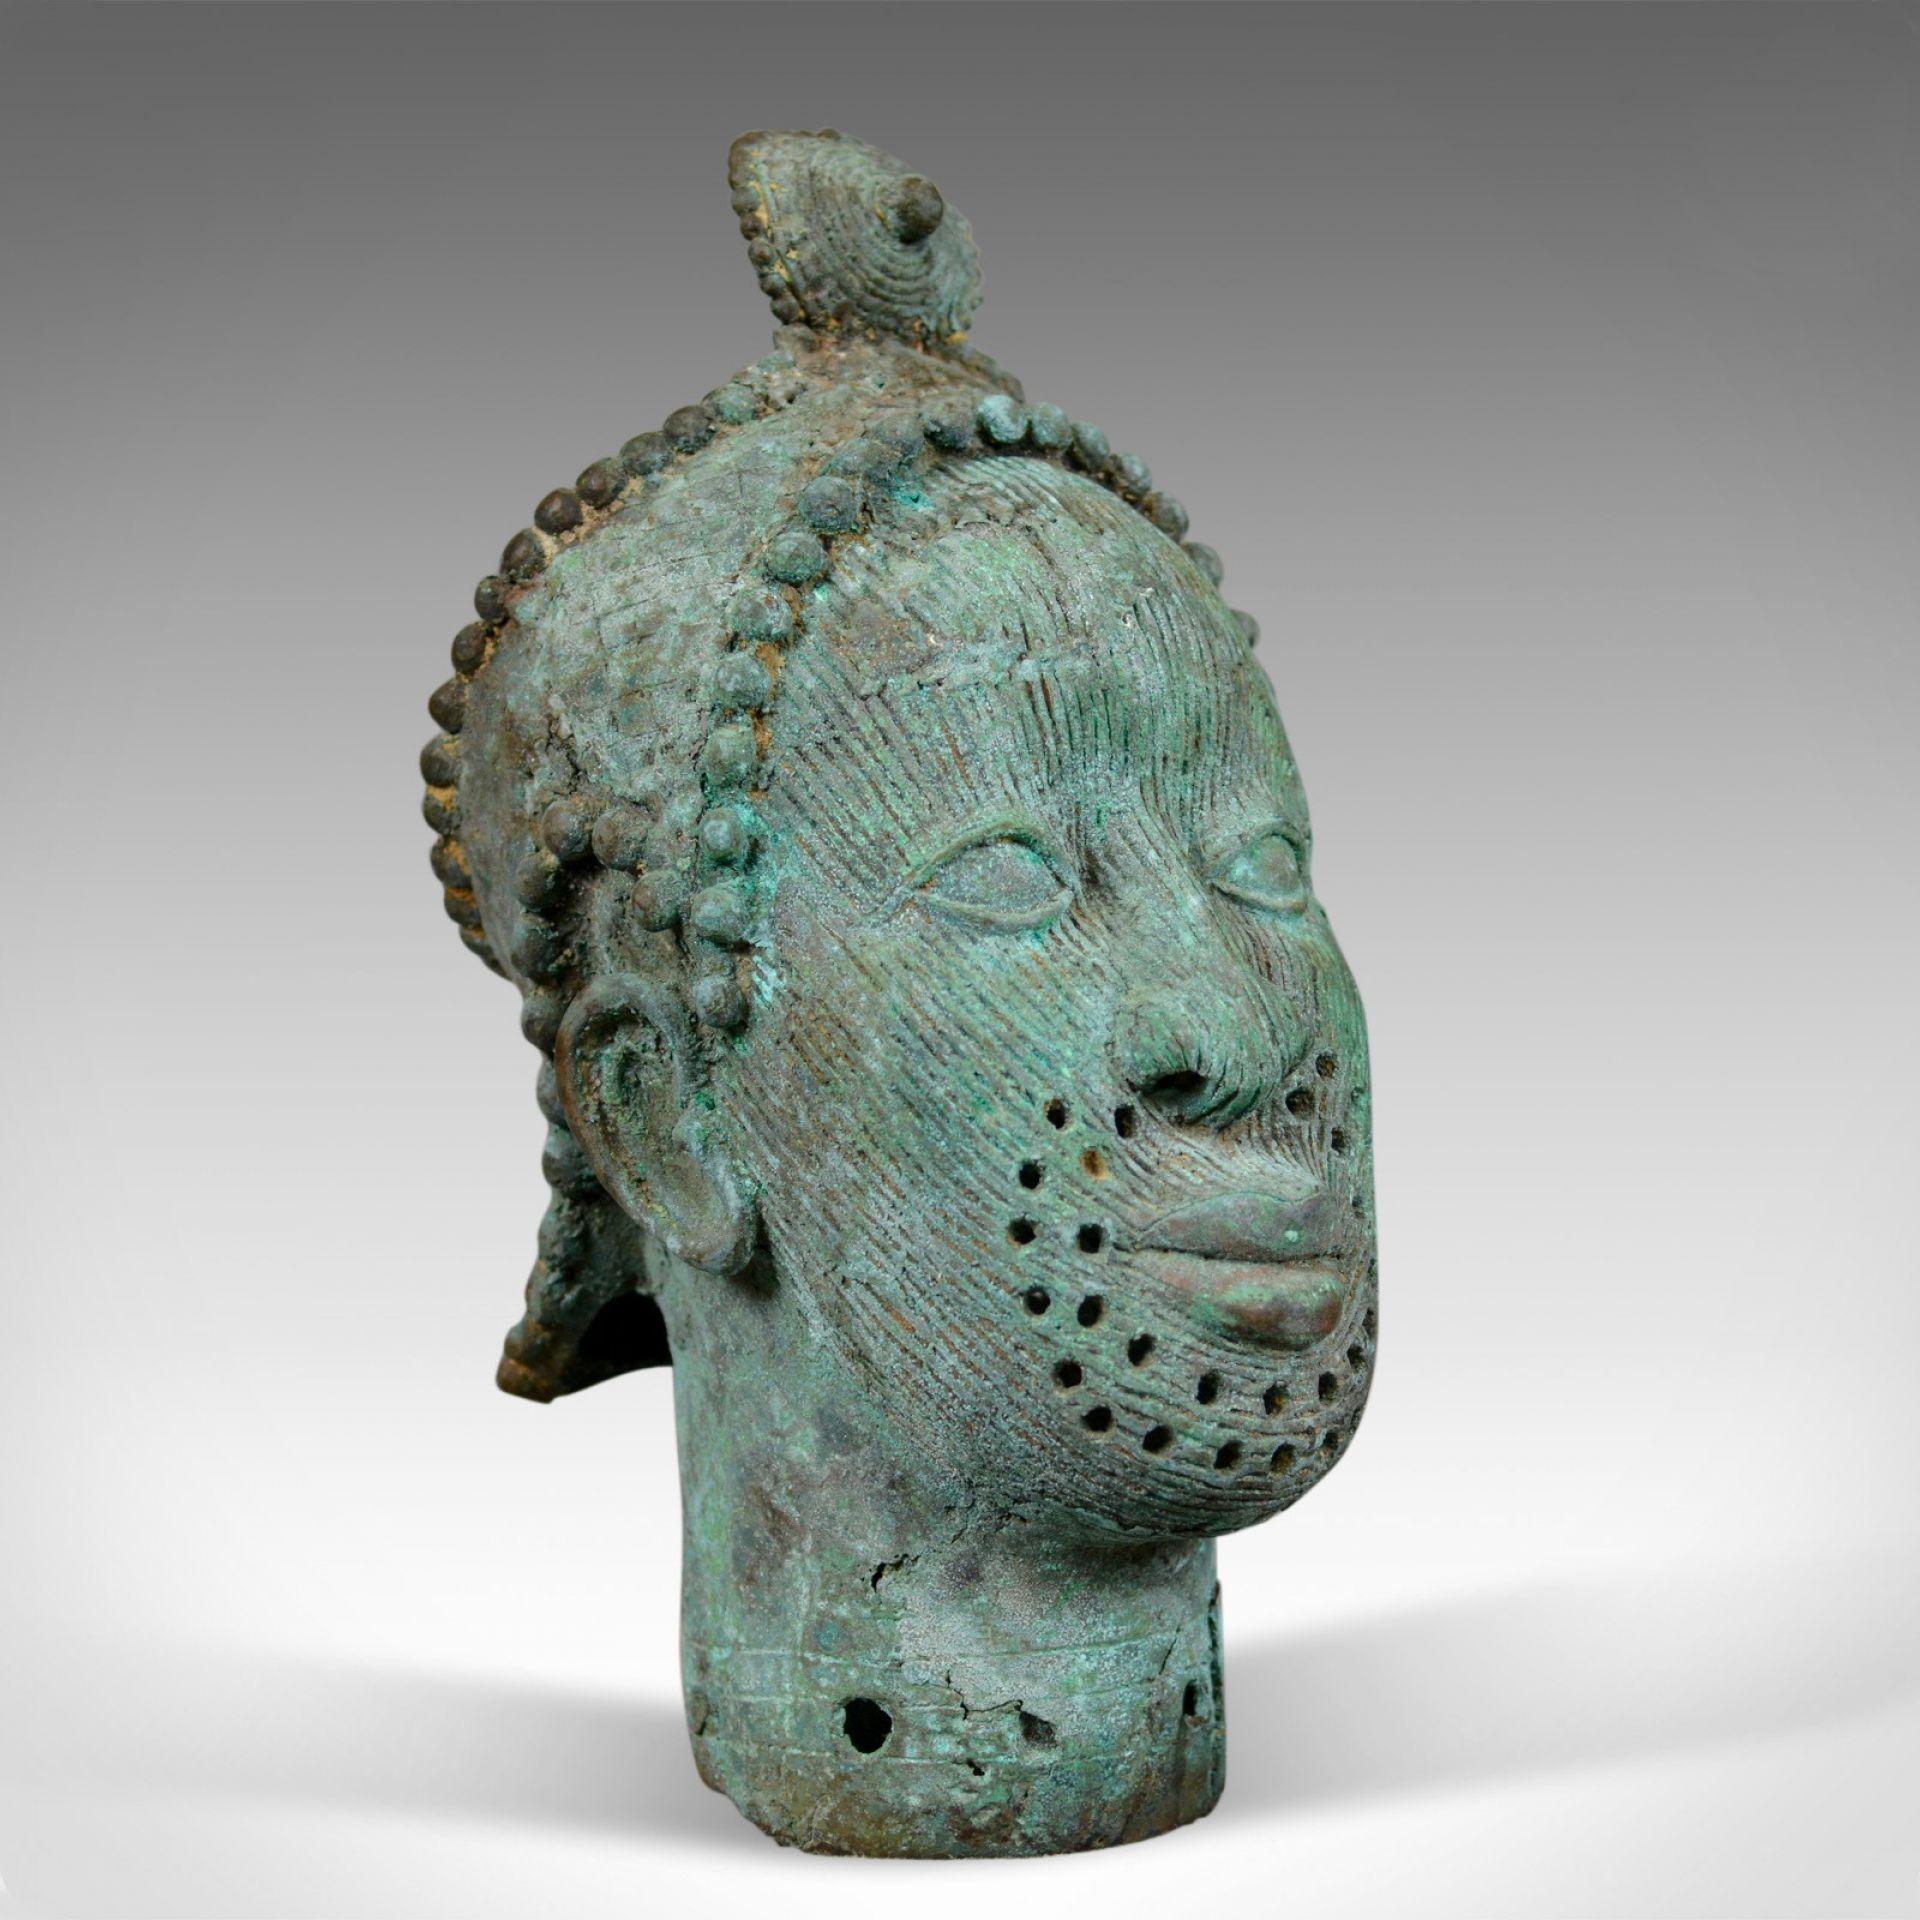 Mid 20th Century African Bronze Bust, Head, Sculpture, Art